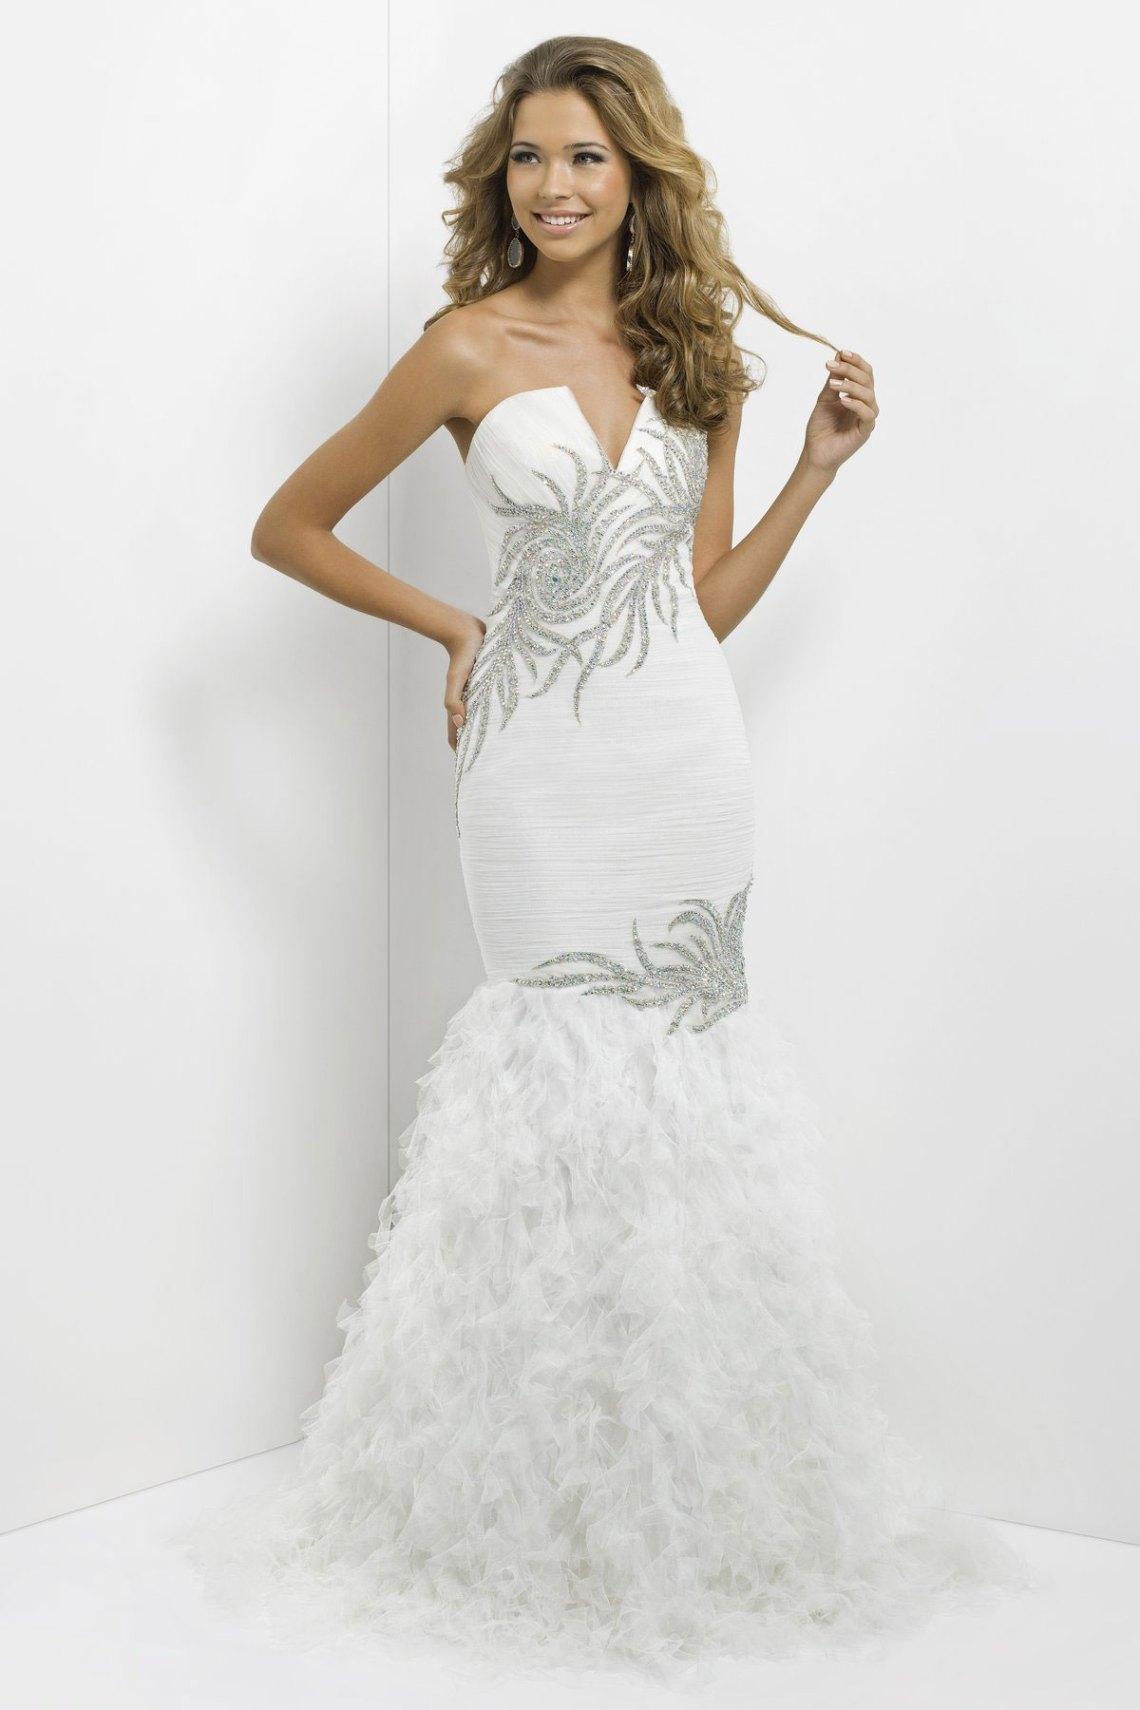 aisle style dresses (5)